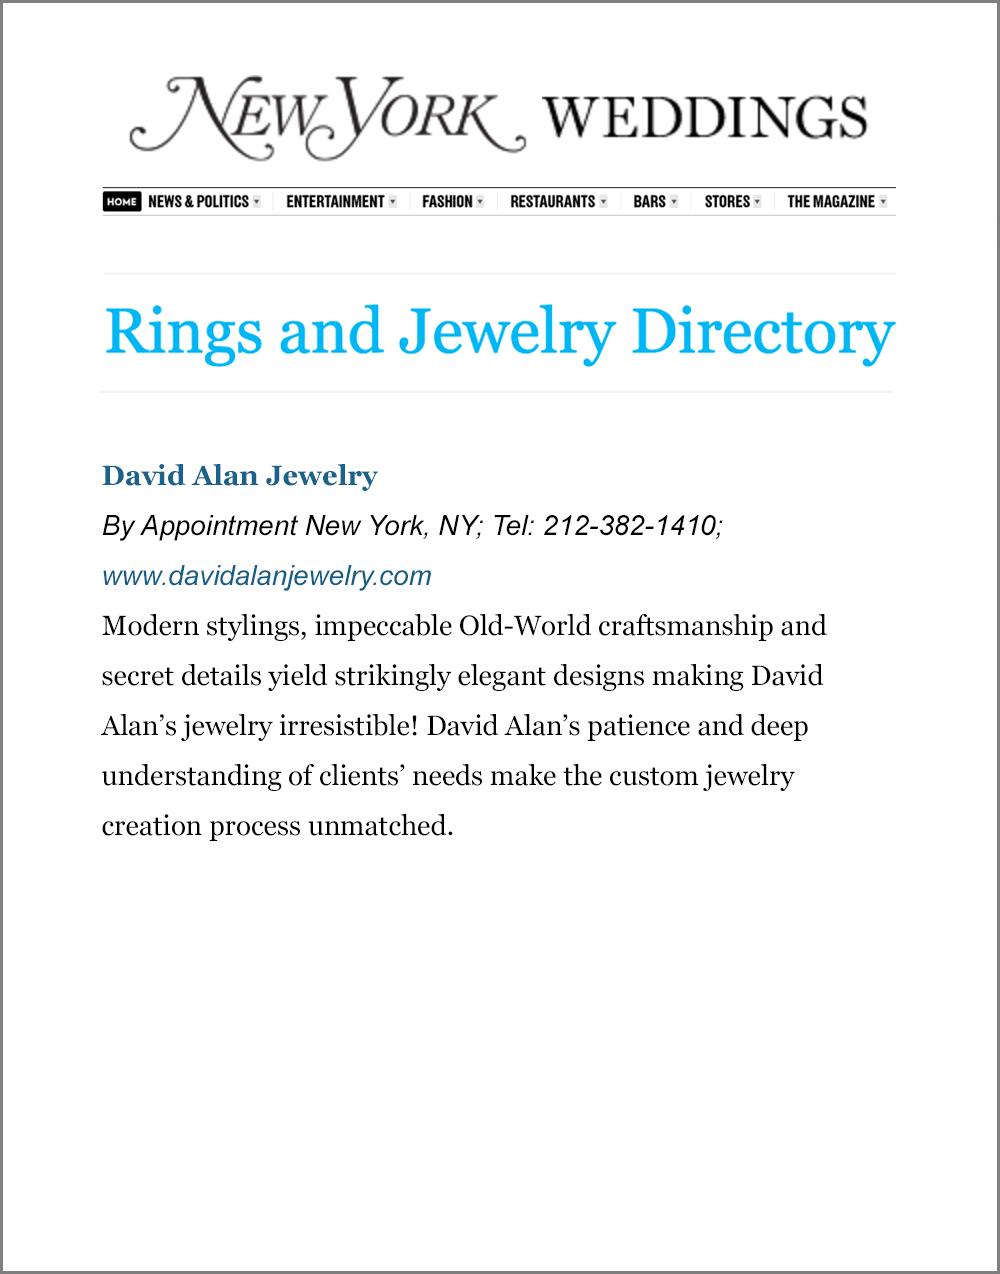 David Alan Jewelry Press, New York Weddings